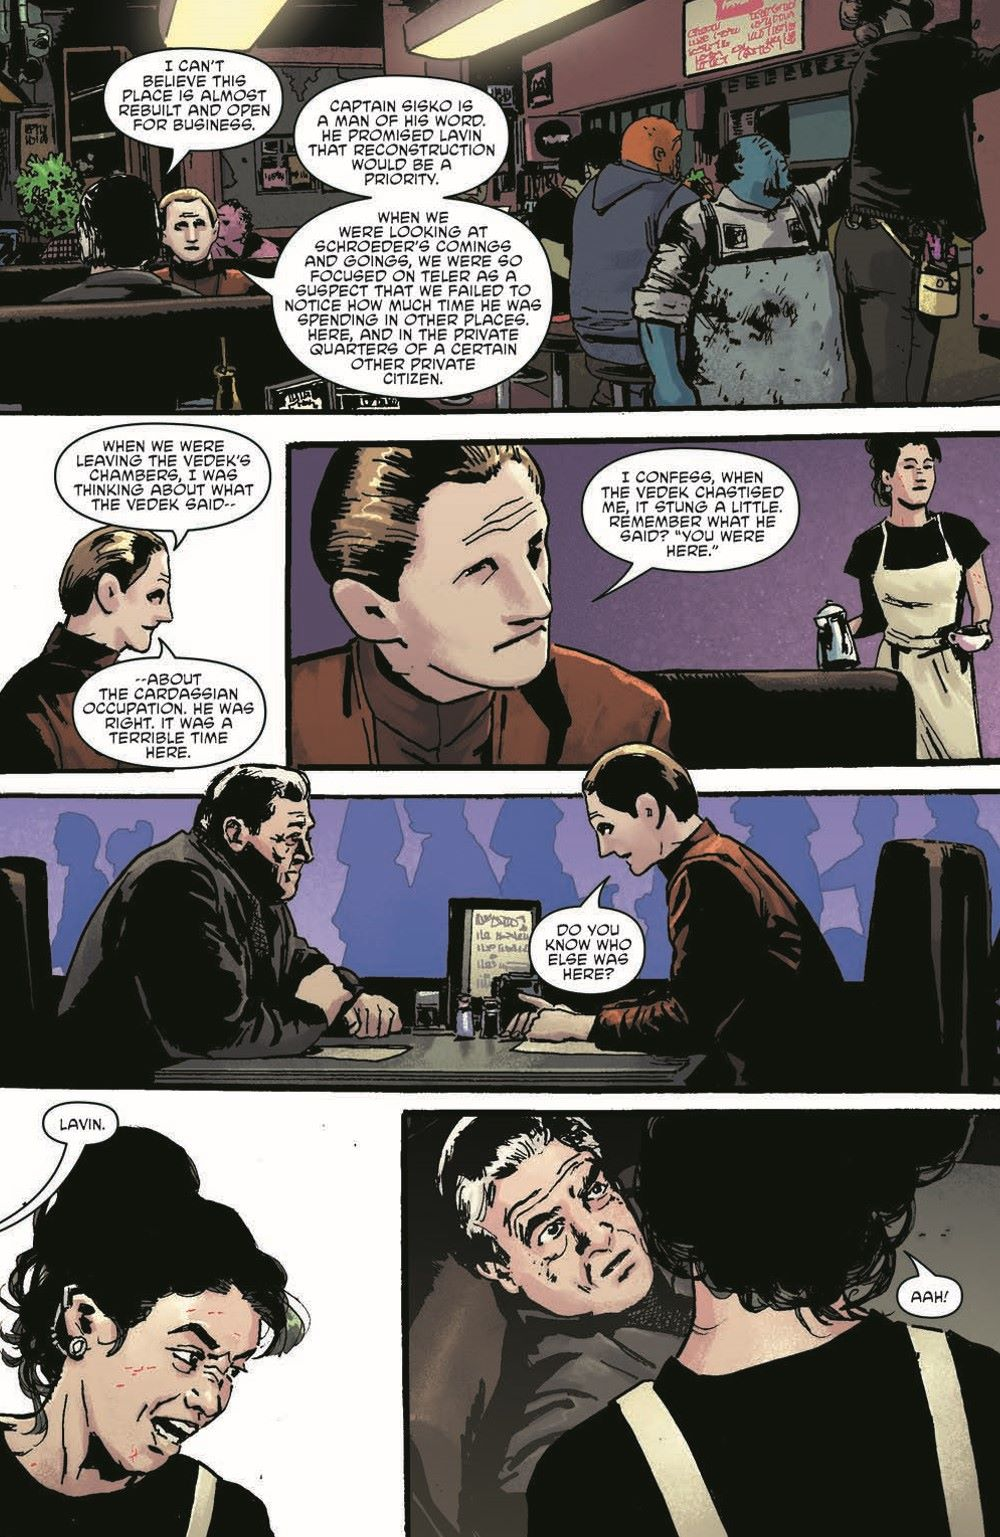 ST_DS9_04-pr-7 ComicList Previews: STAR TREK DEEP SPACE NINE TOO LONG A SACRIFICE #4 (OF 4)